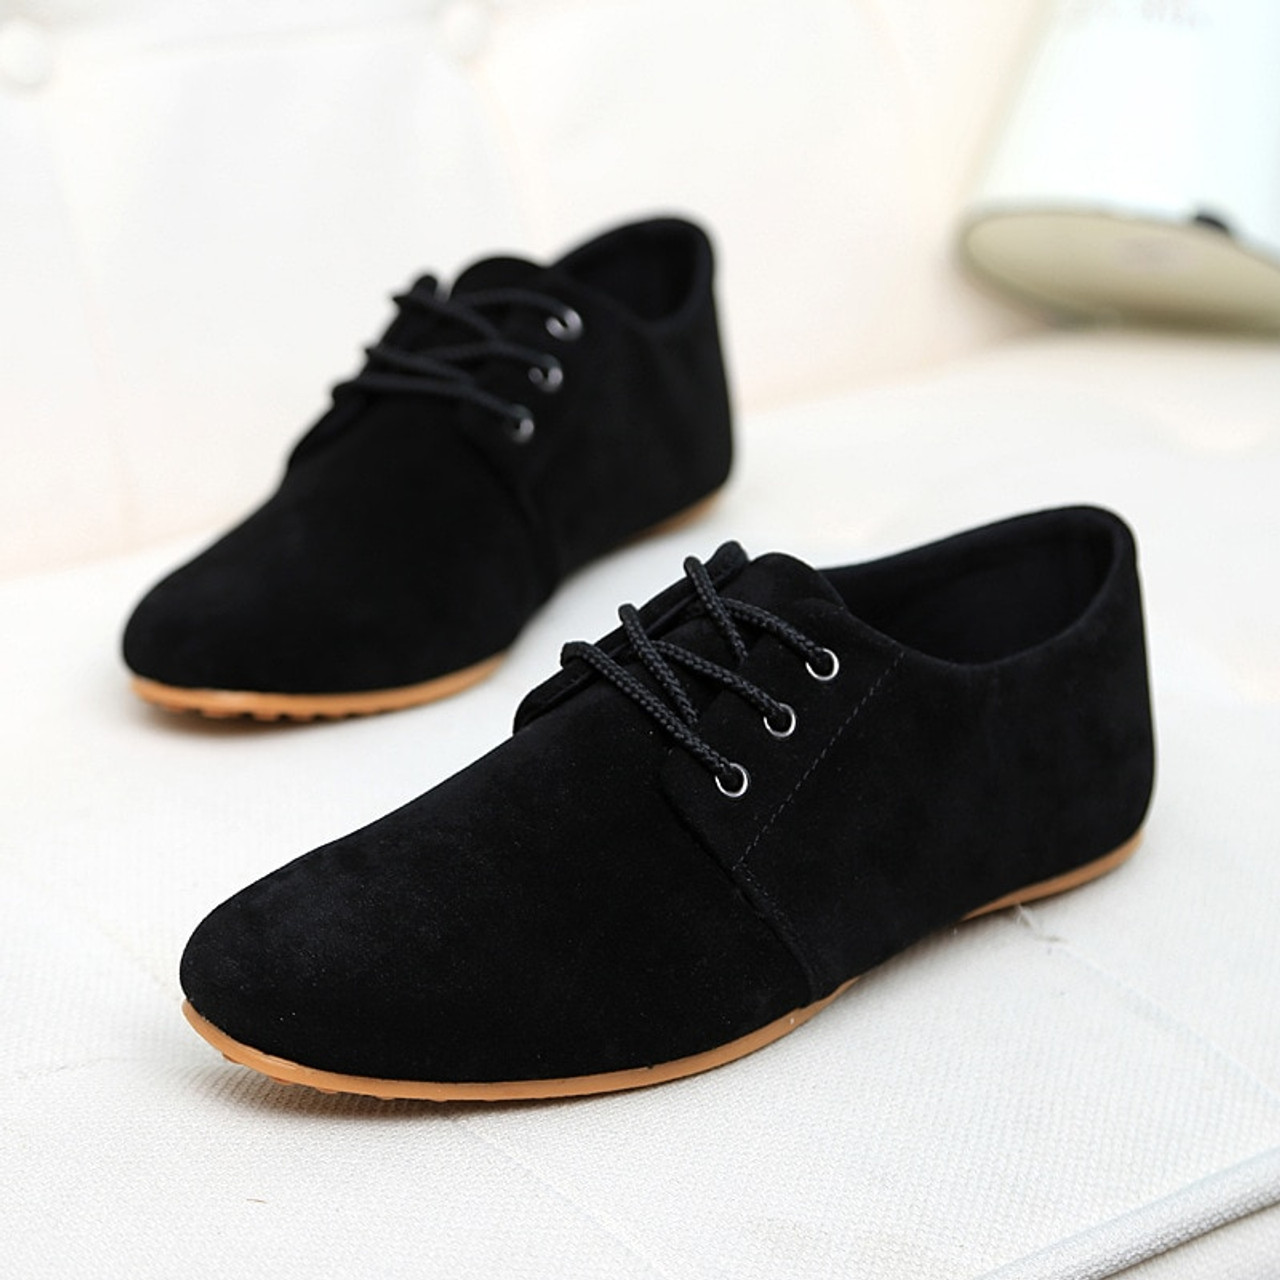 ZYYZYM Men Casual Shoes Spring Autumn